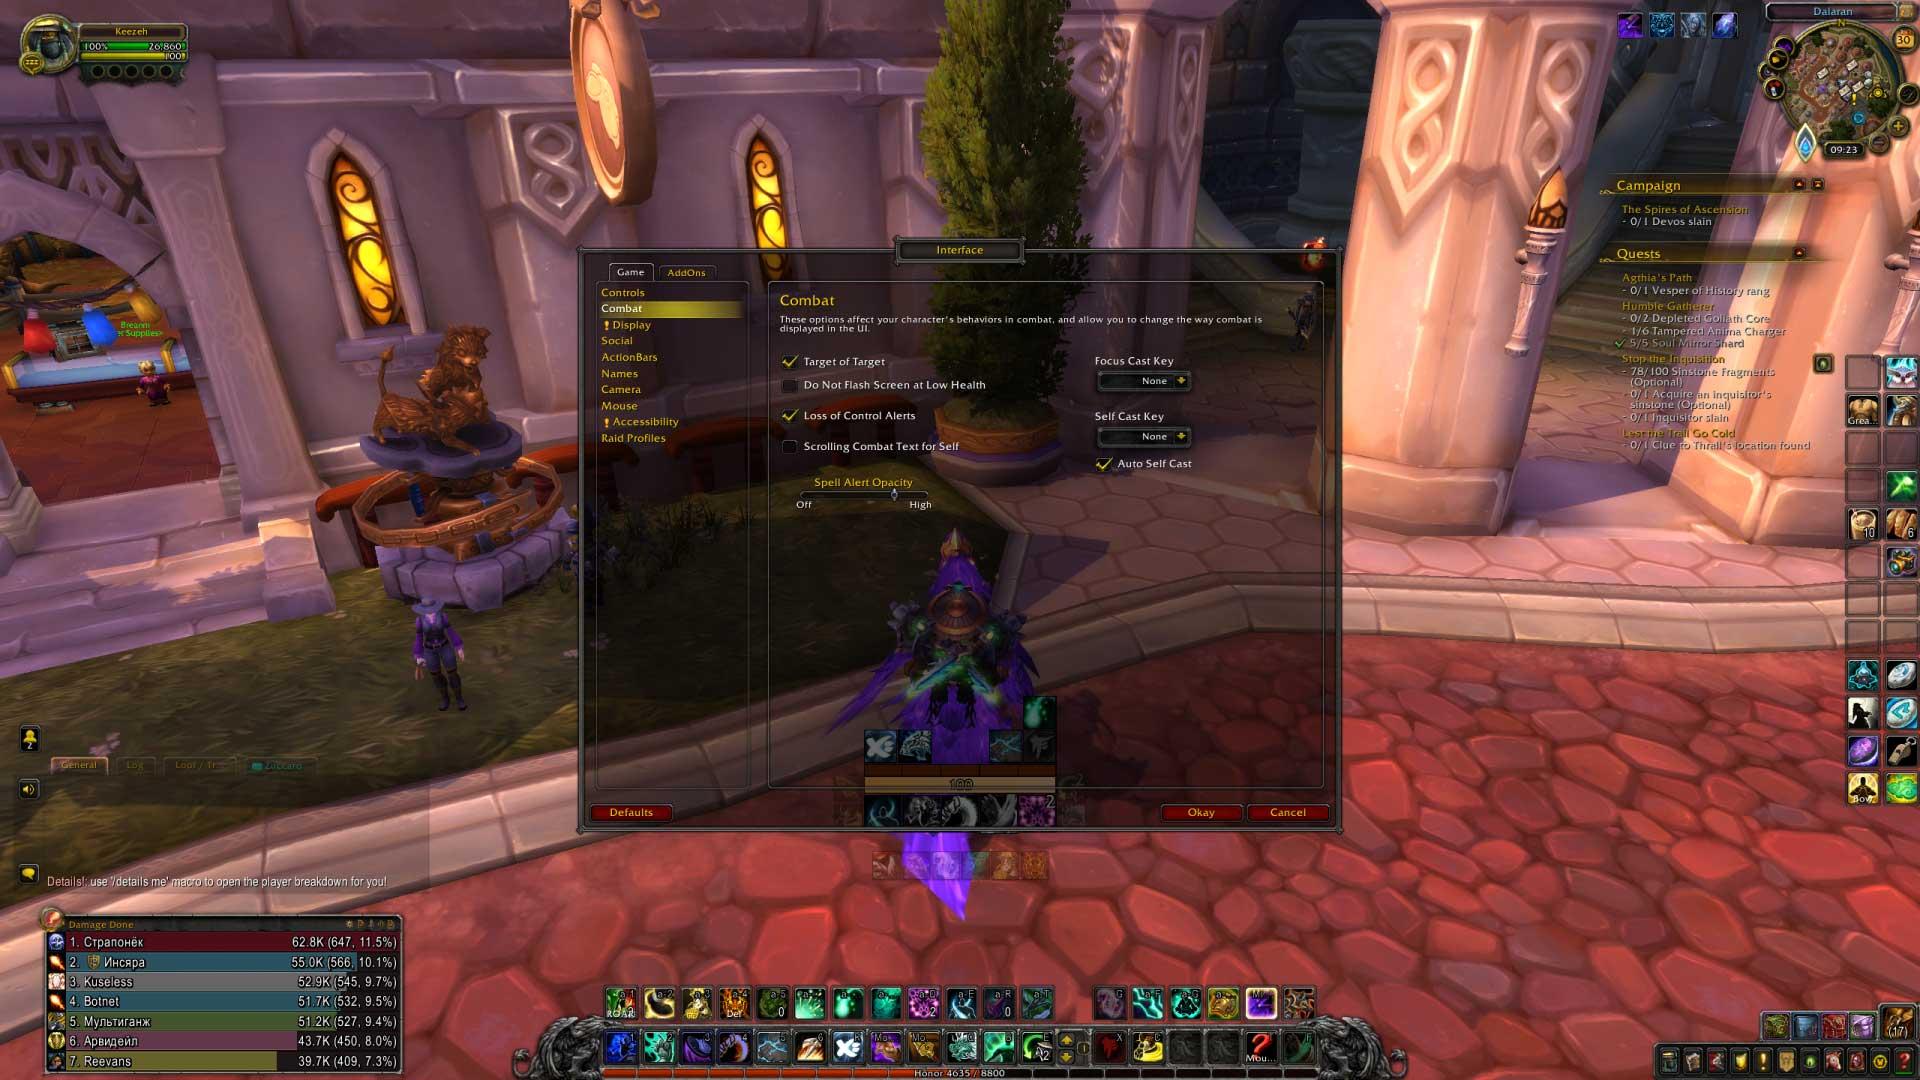 World-of-Warcraft-Ustawienia-interfejsu-2